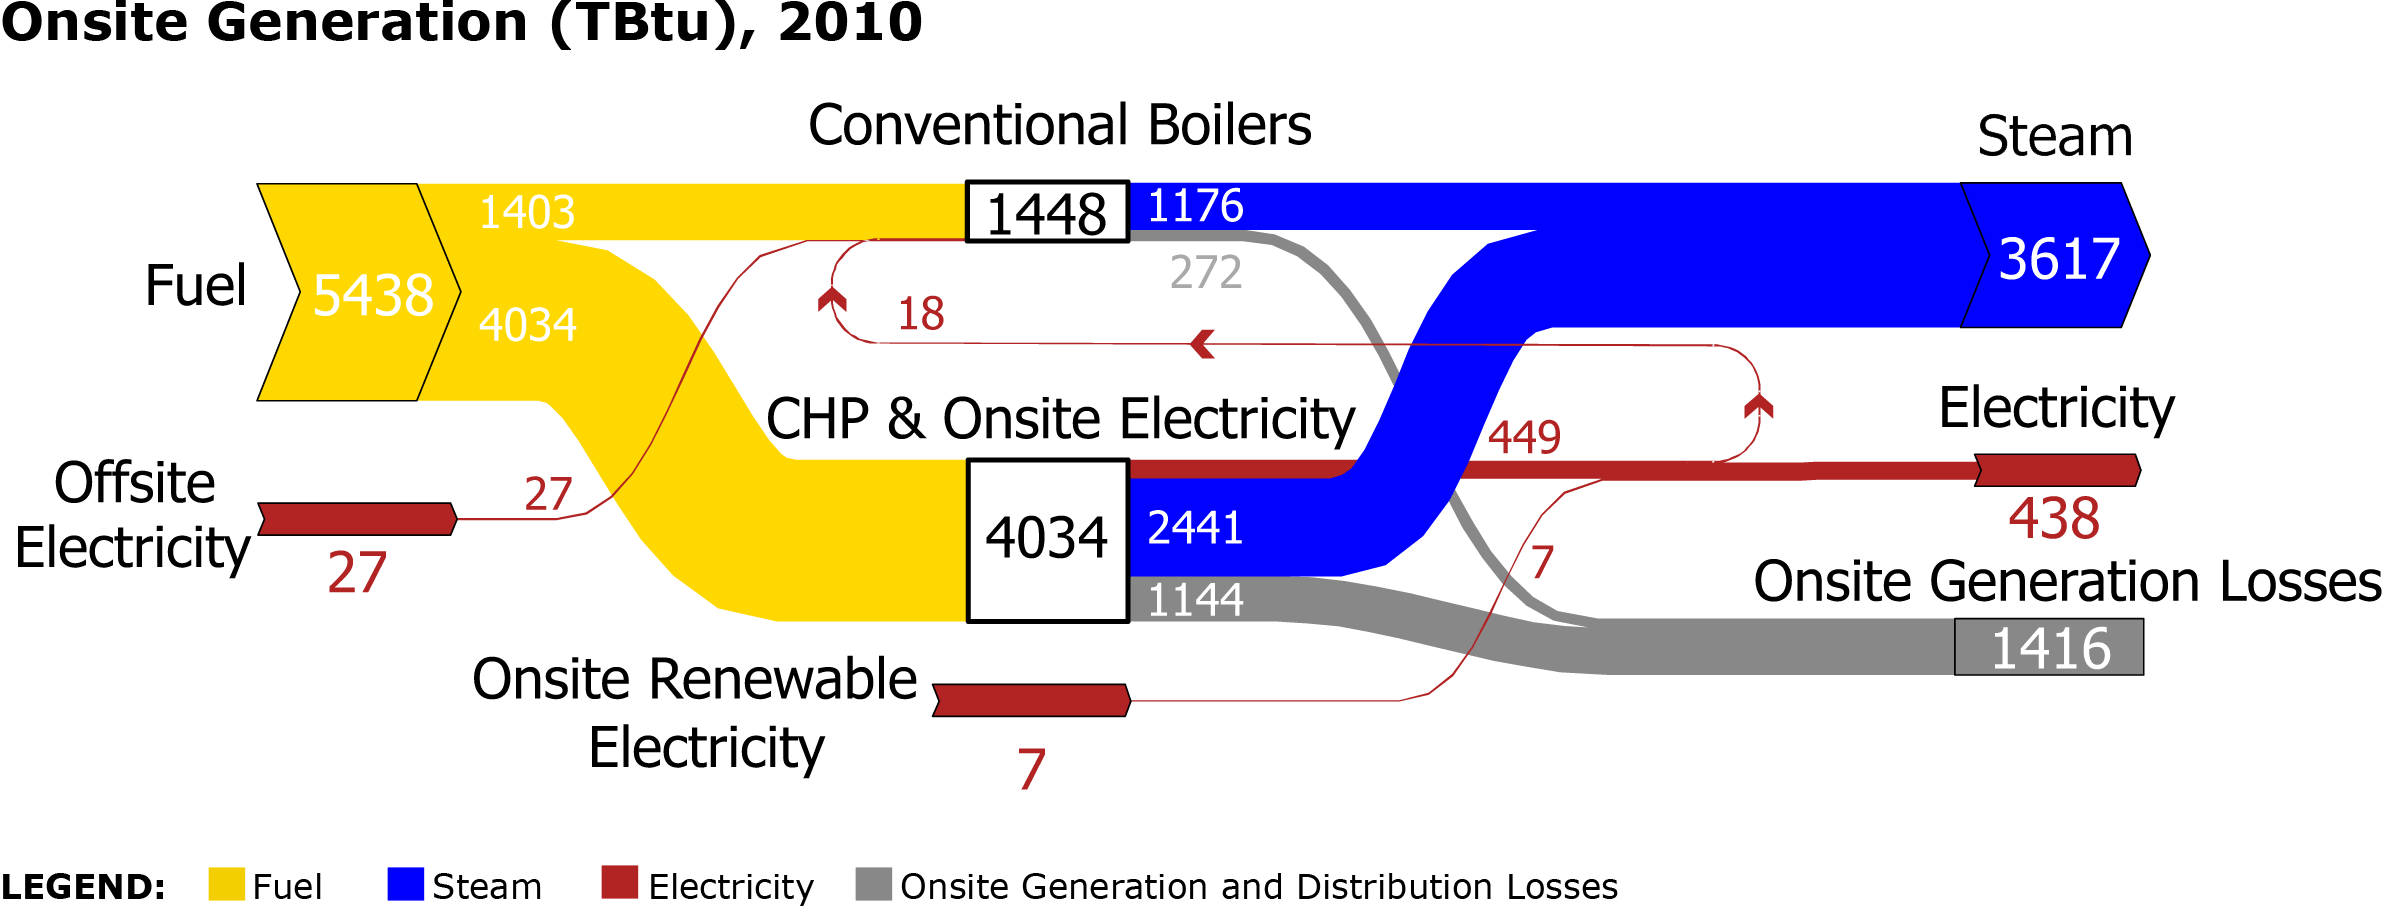 sankey diagram for solar power how to draw swimlane in visio static of onsite generation u s